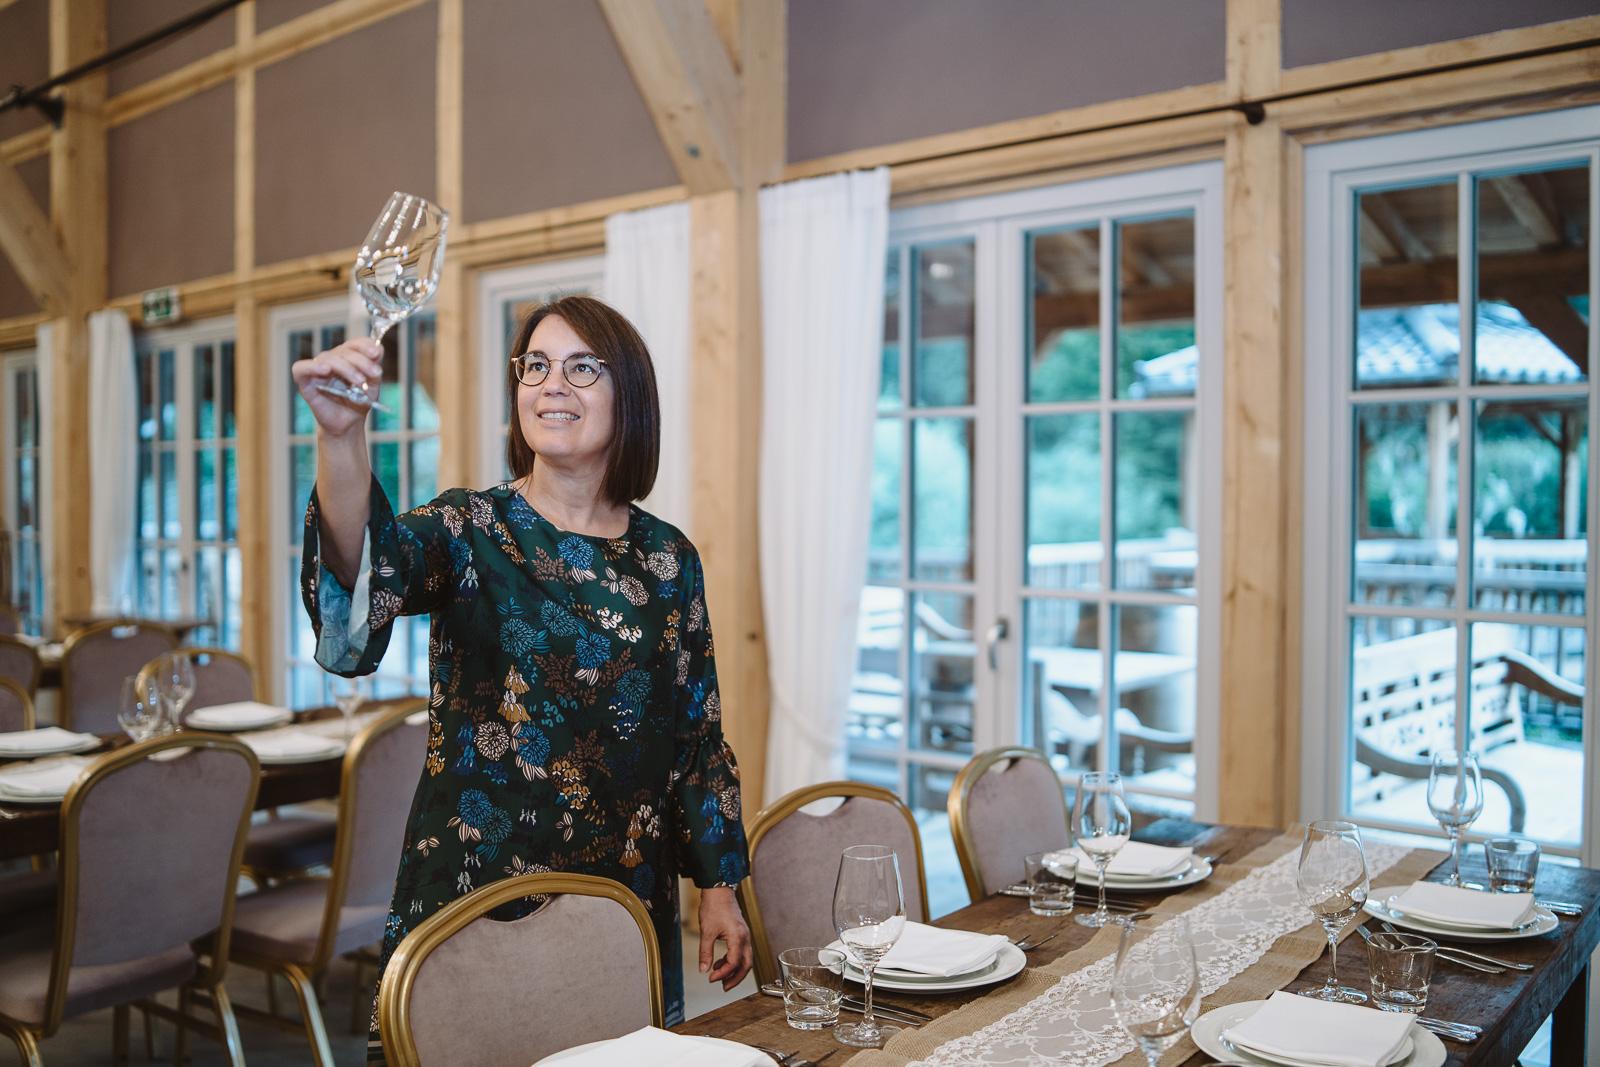 Iris Krolop Weddingplanerin checkt Gläser - Hochzeitsfotografin Bernadett Yehdou